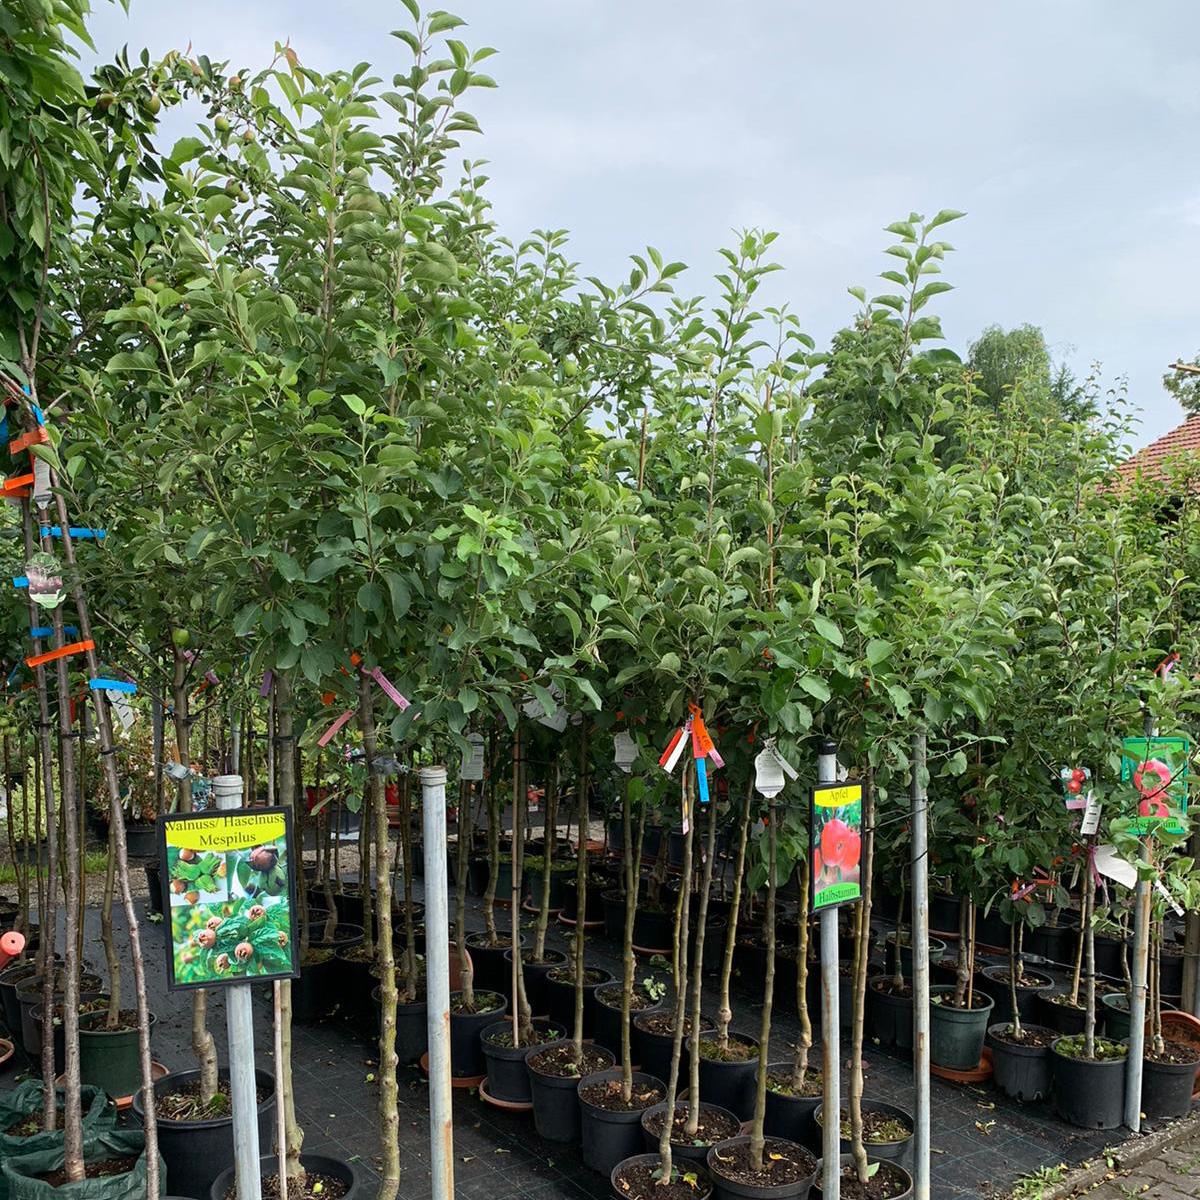 Obstbäume Beerensträucher Garten Premm Roding